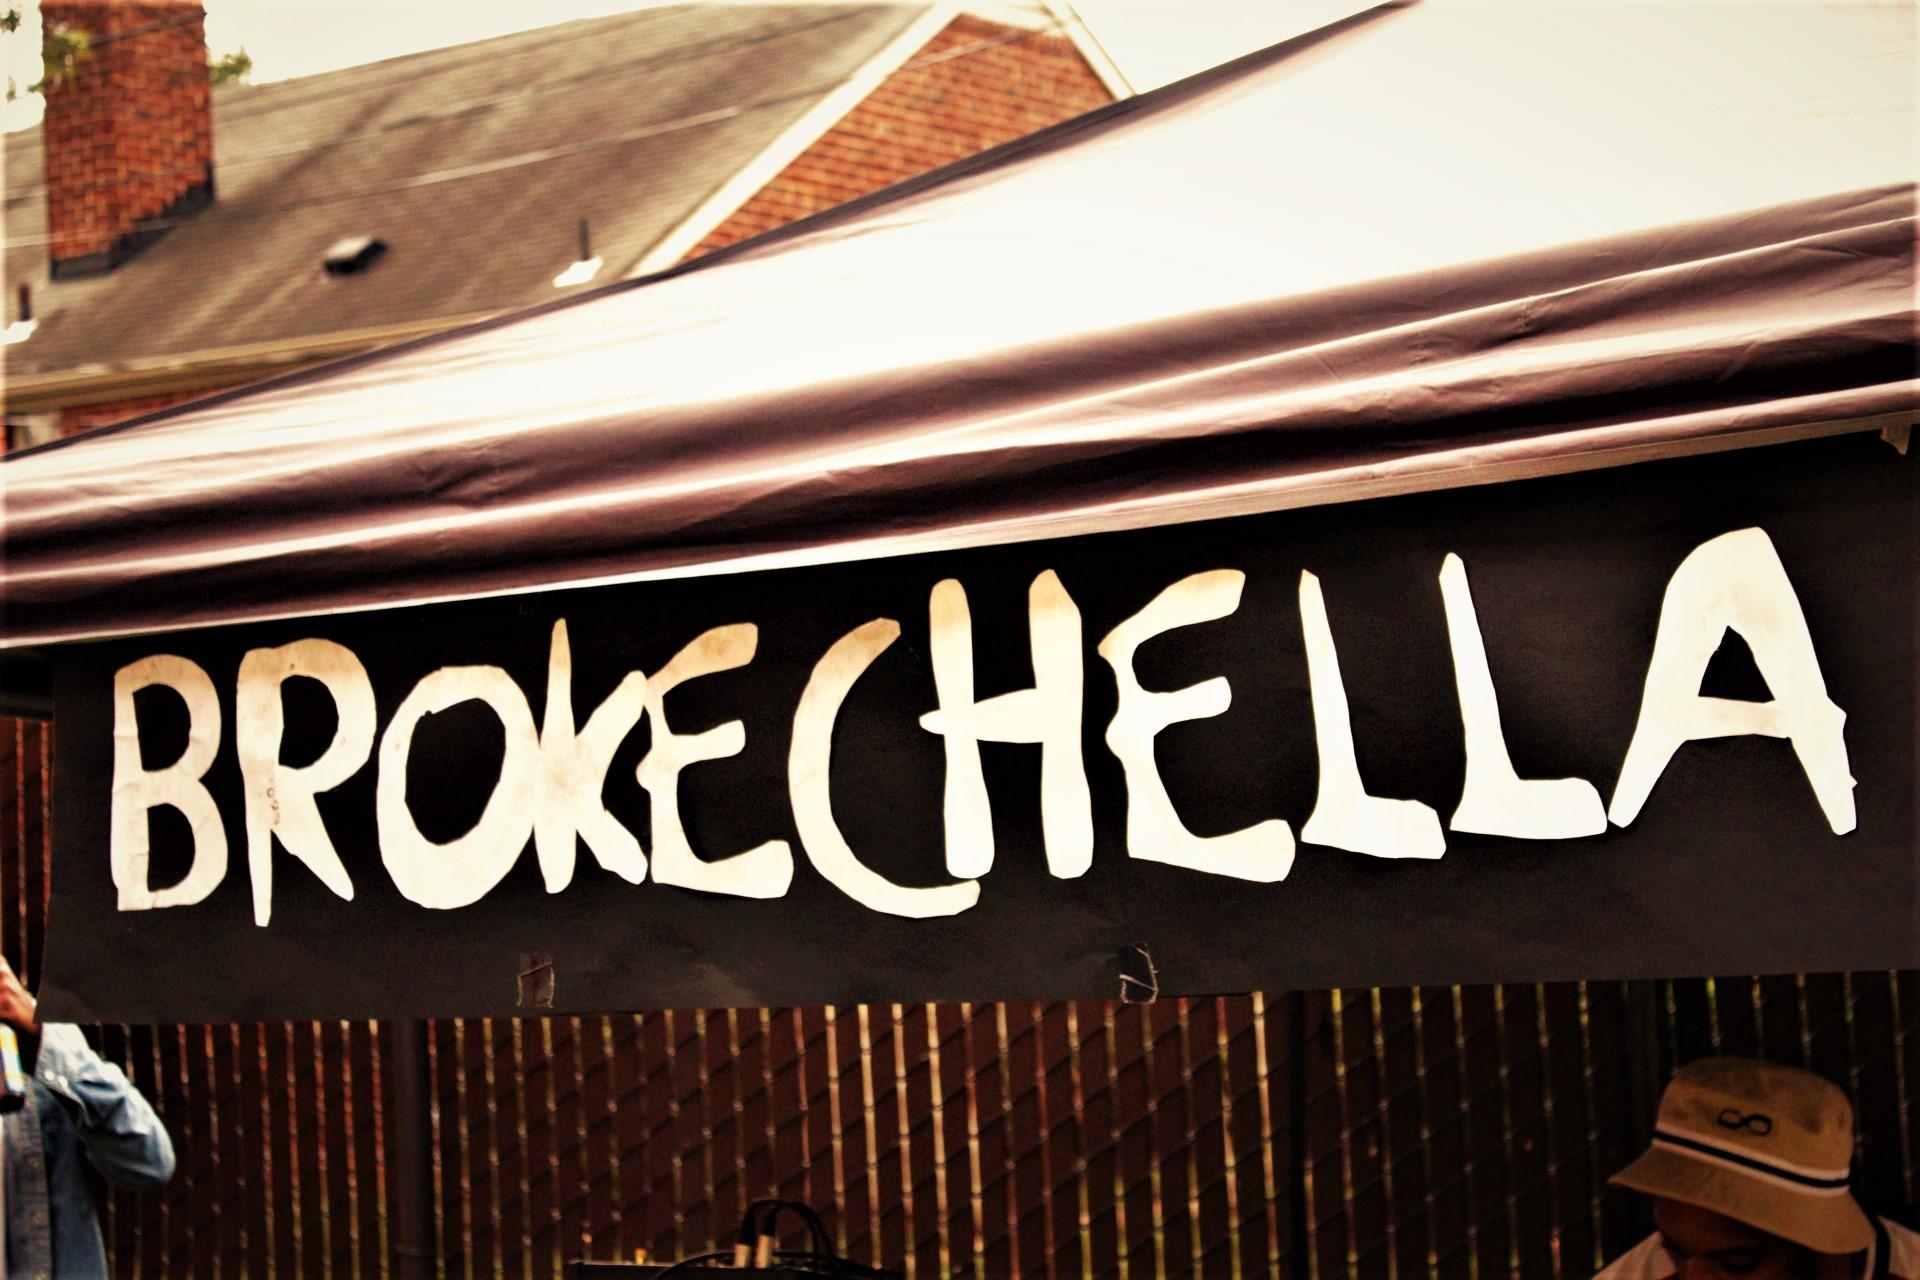 Brokechella 2017